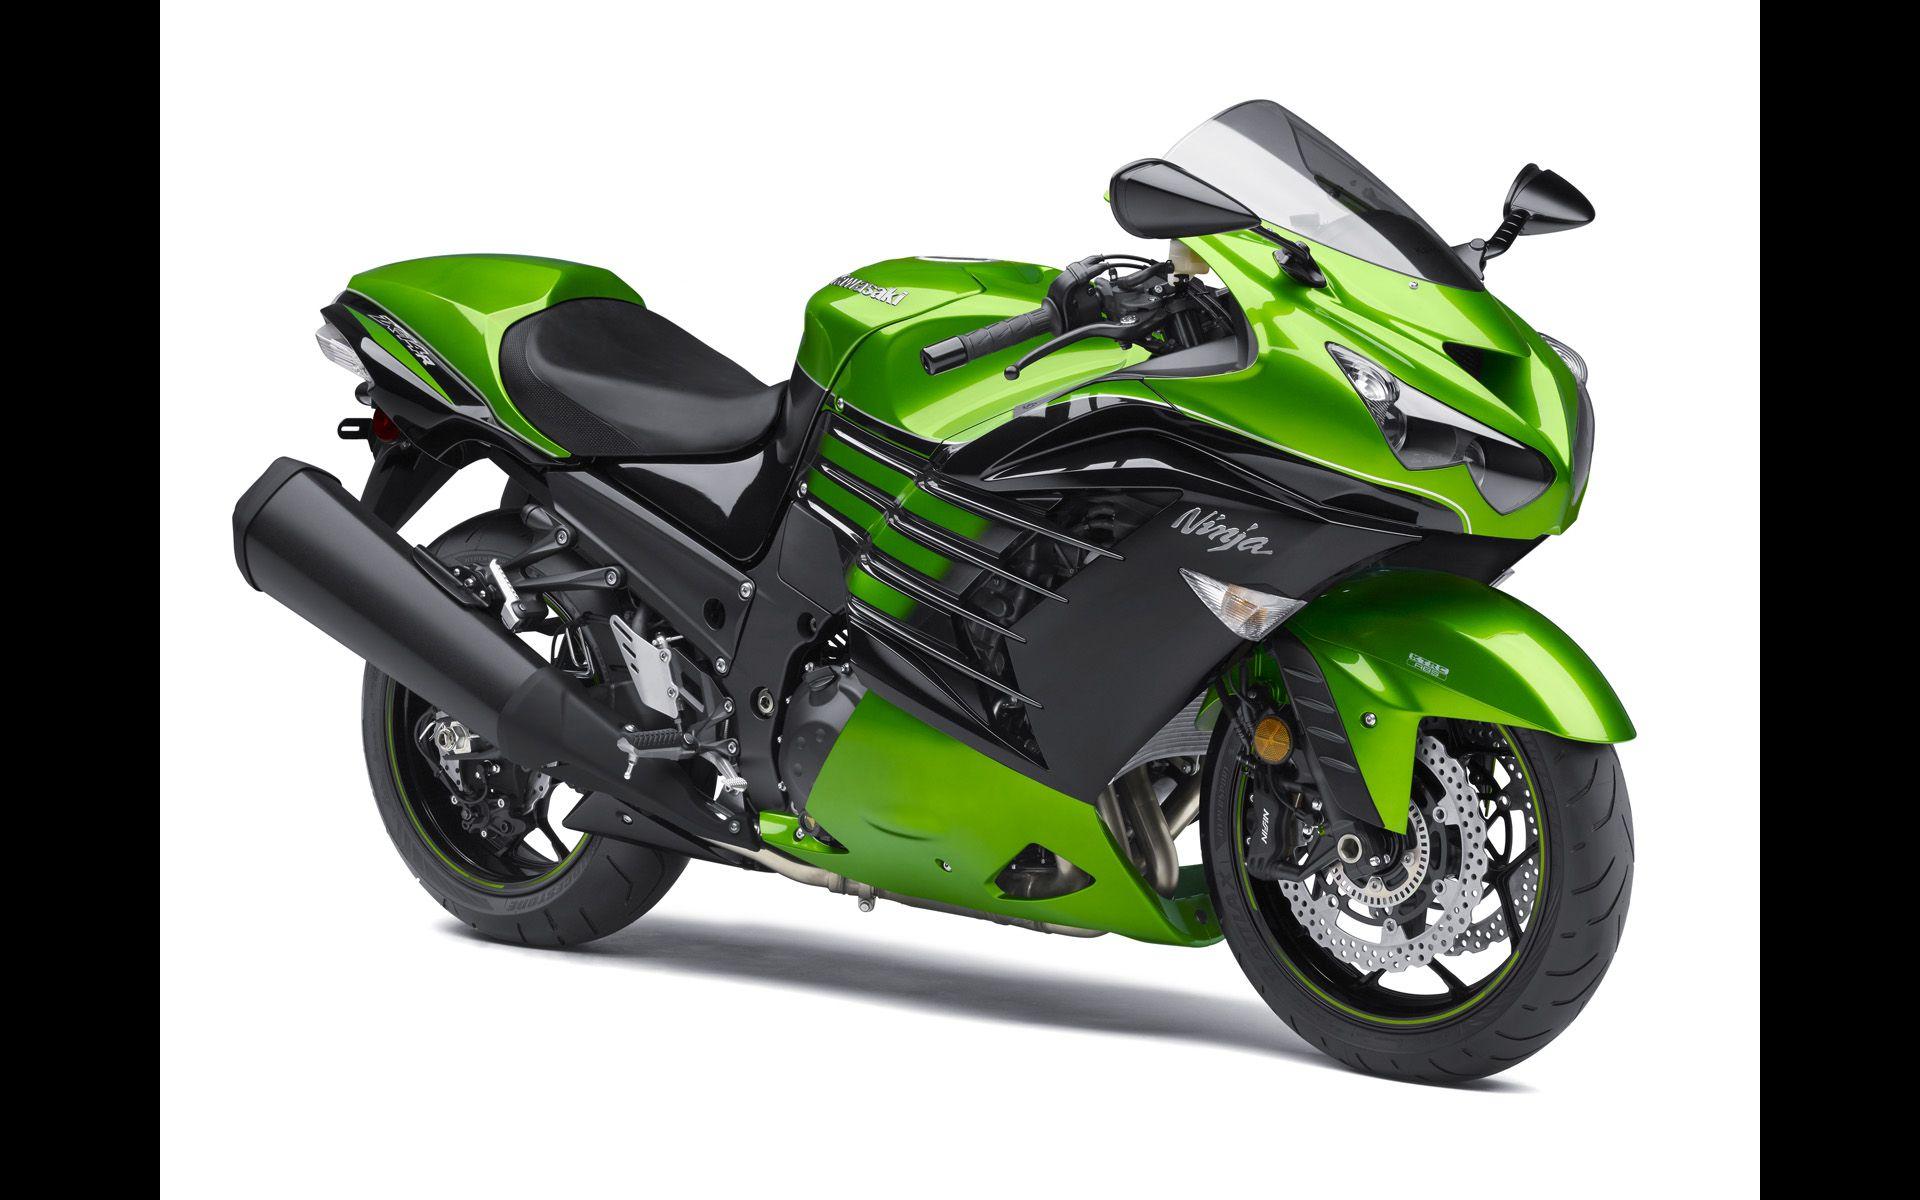 Pin by heiber torres on motos Kawasaki motorcycles